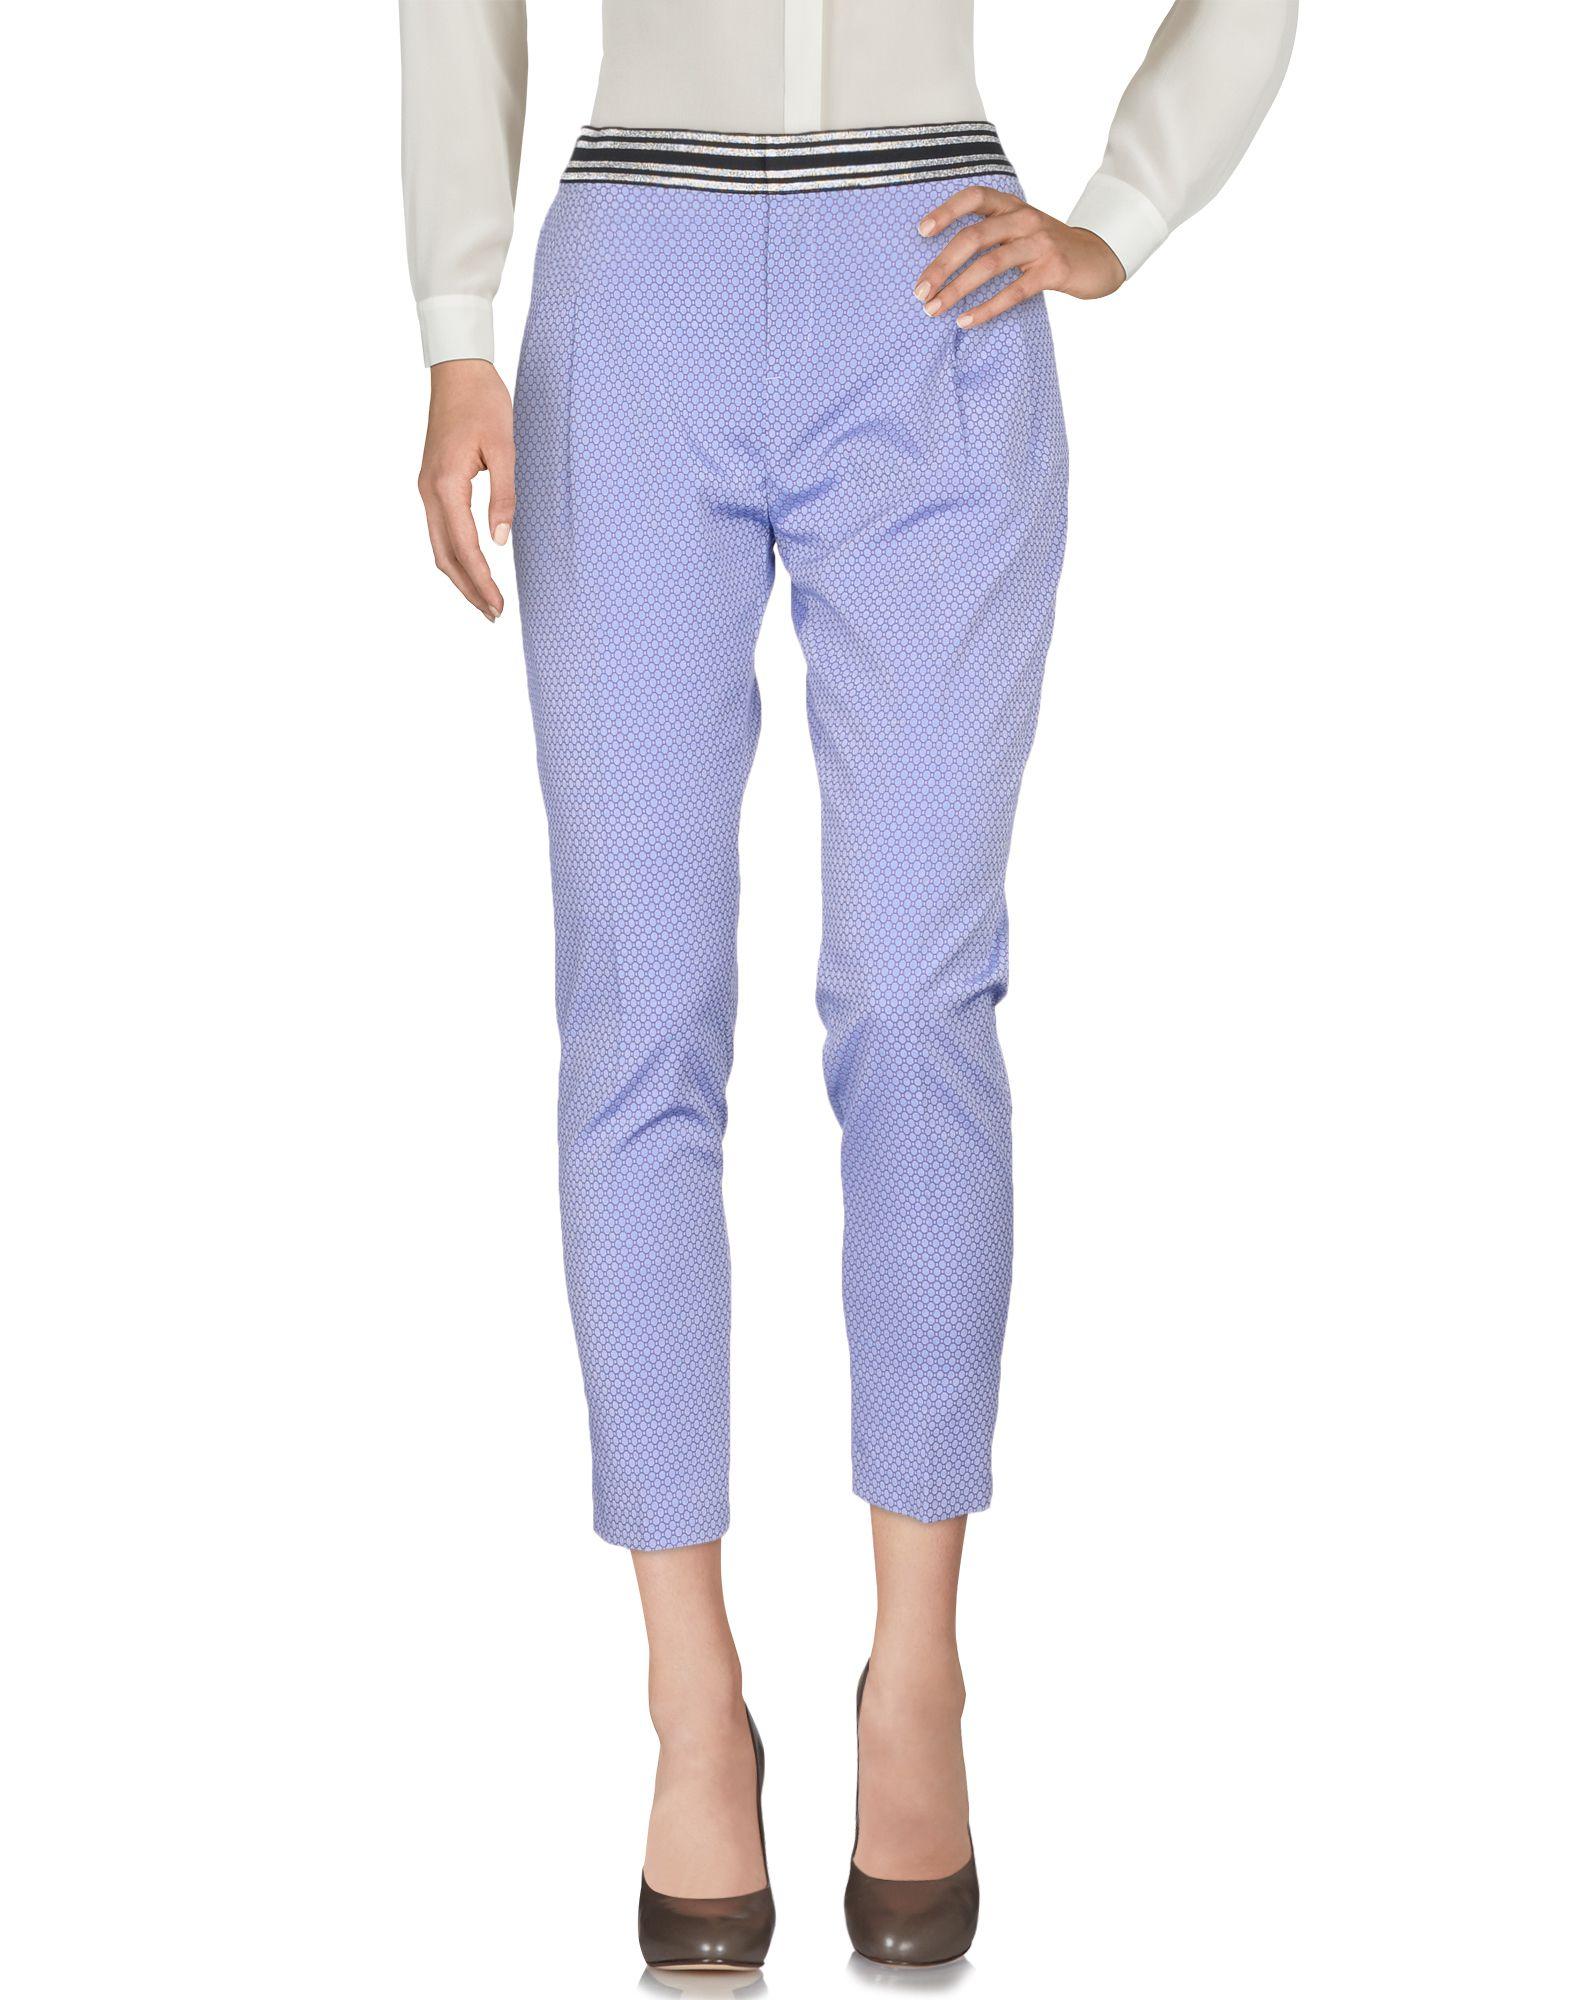 Pantalone Pantalone Pantalone Teresa Dainelli donna - 36758292FX 4cd